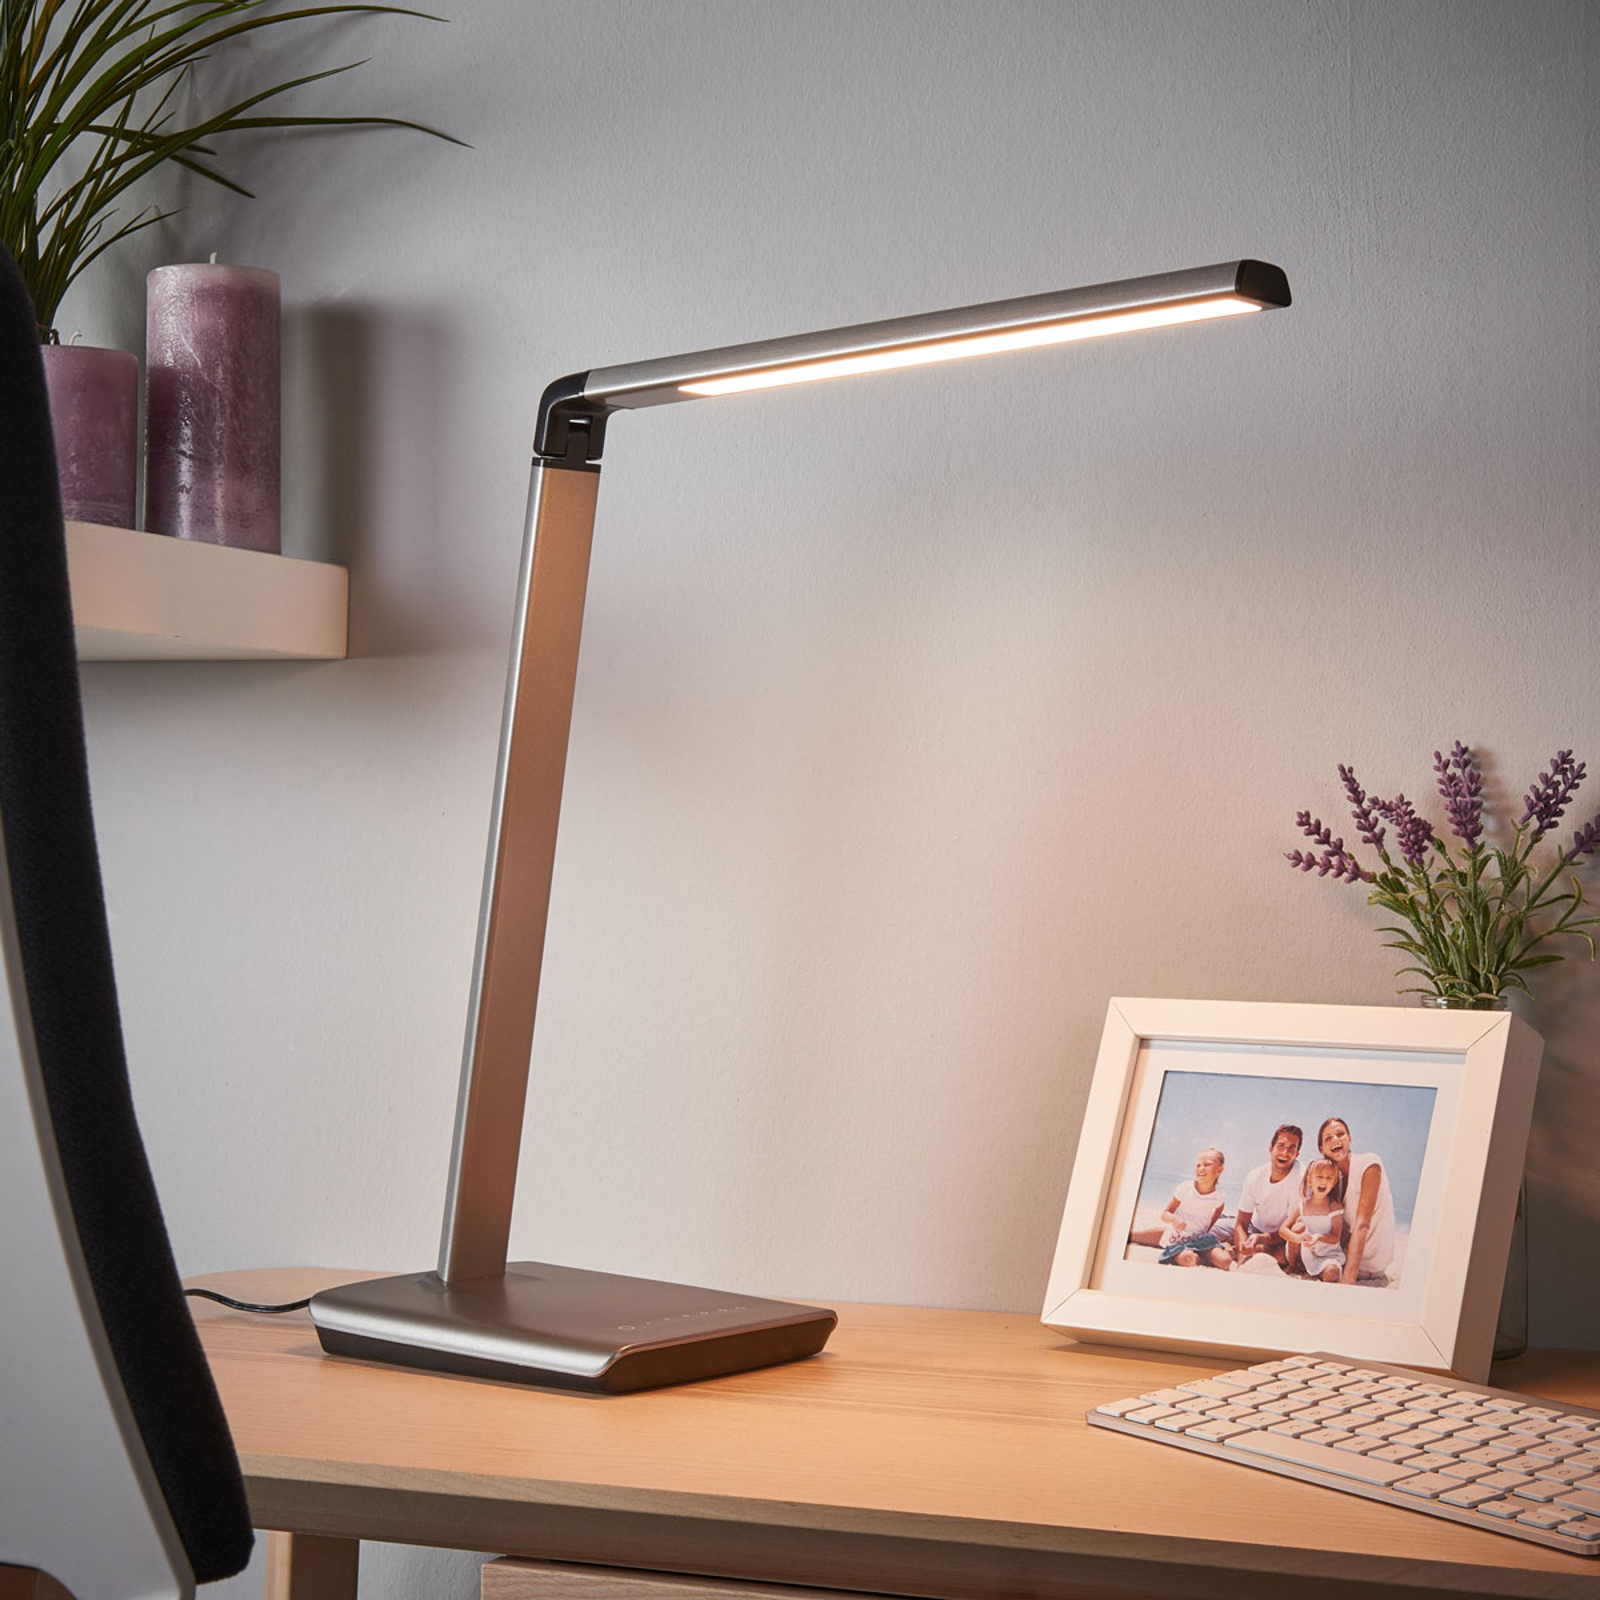 LED-bordslampa Kuno, gråmetallic, dimmer, USB